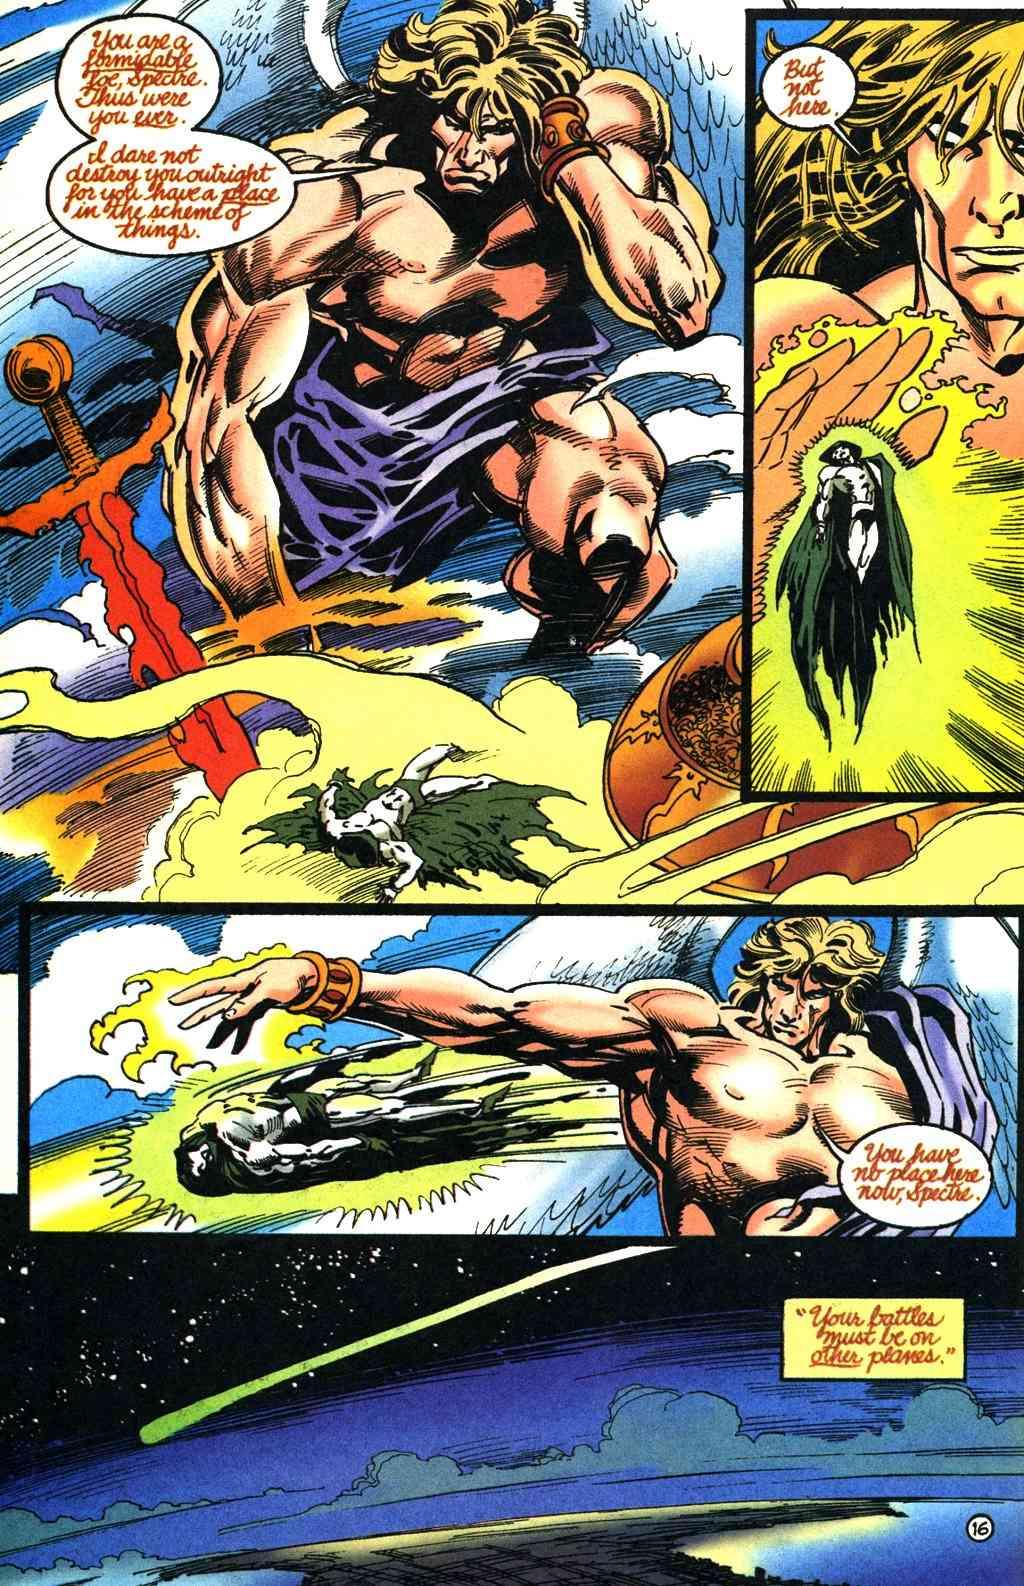 The Presence (DC Comics) and The Presence (Vertigo Comics) Spectr11